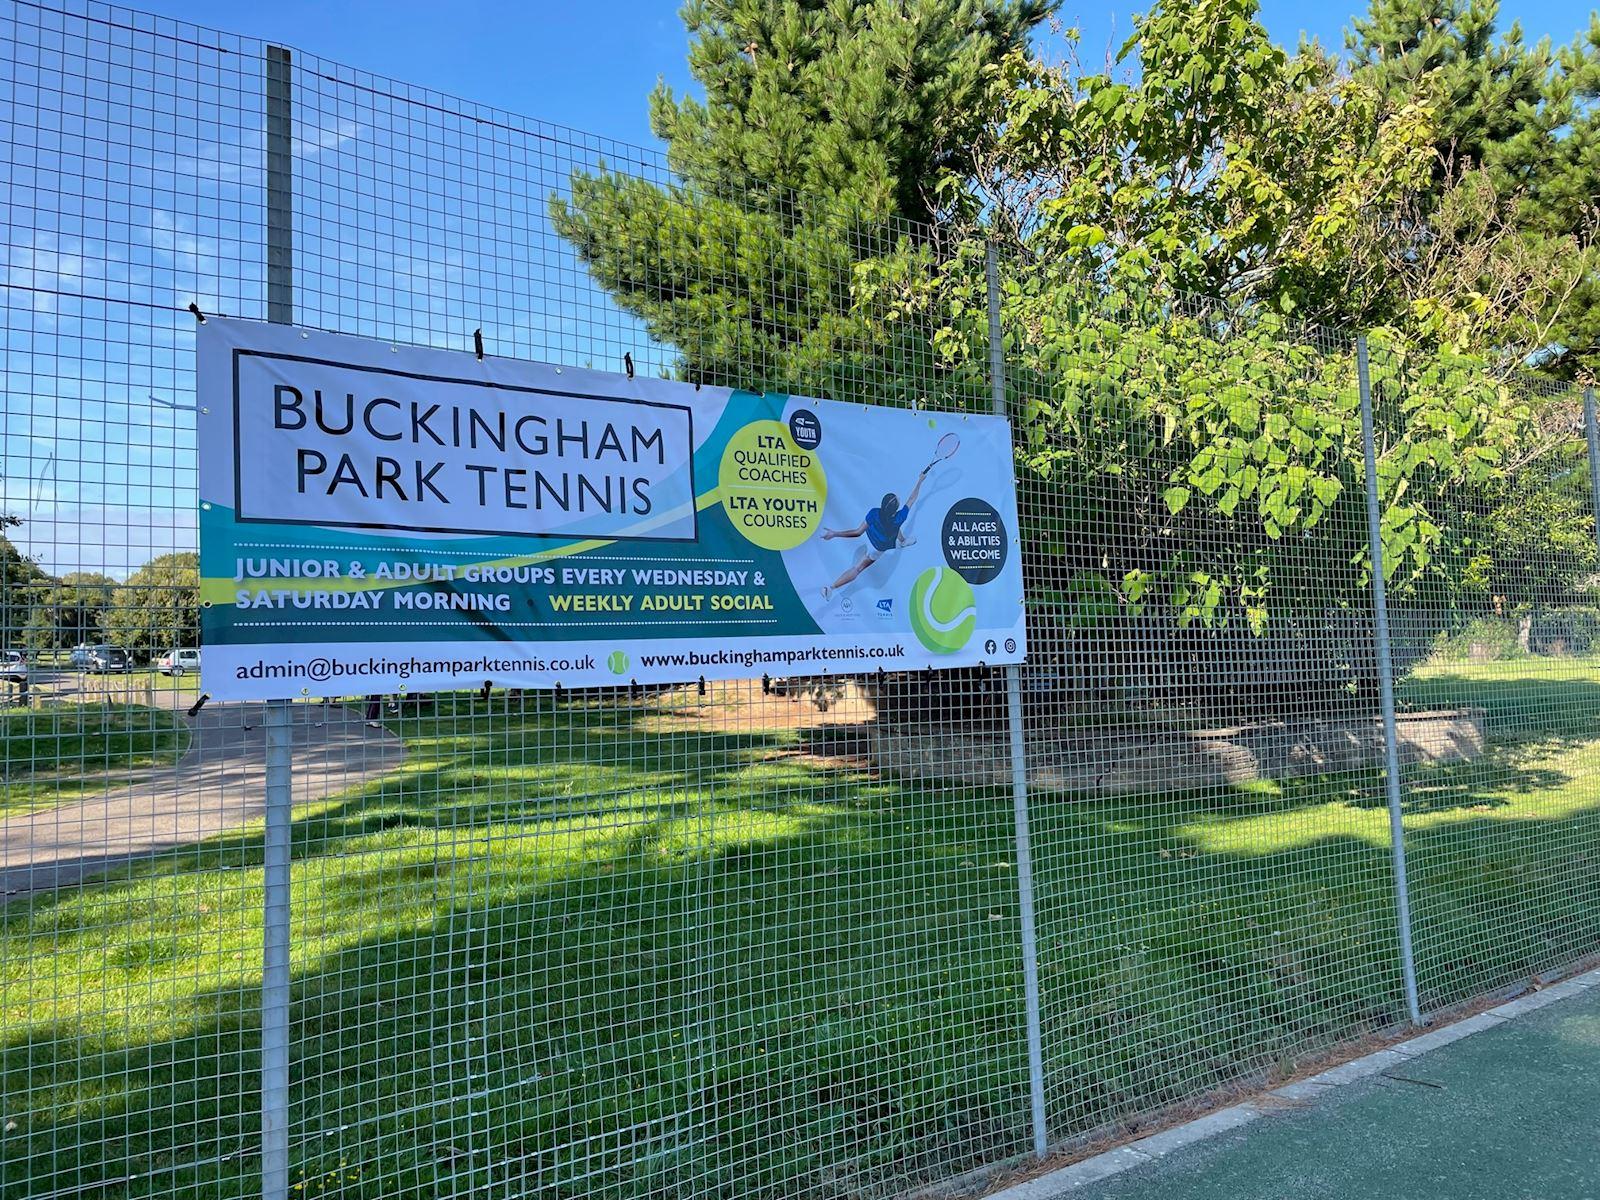 Buckingham Park Tennis